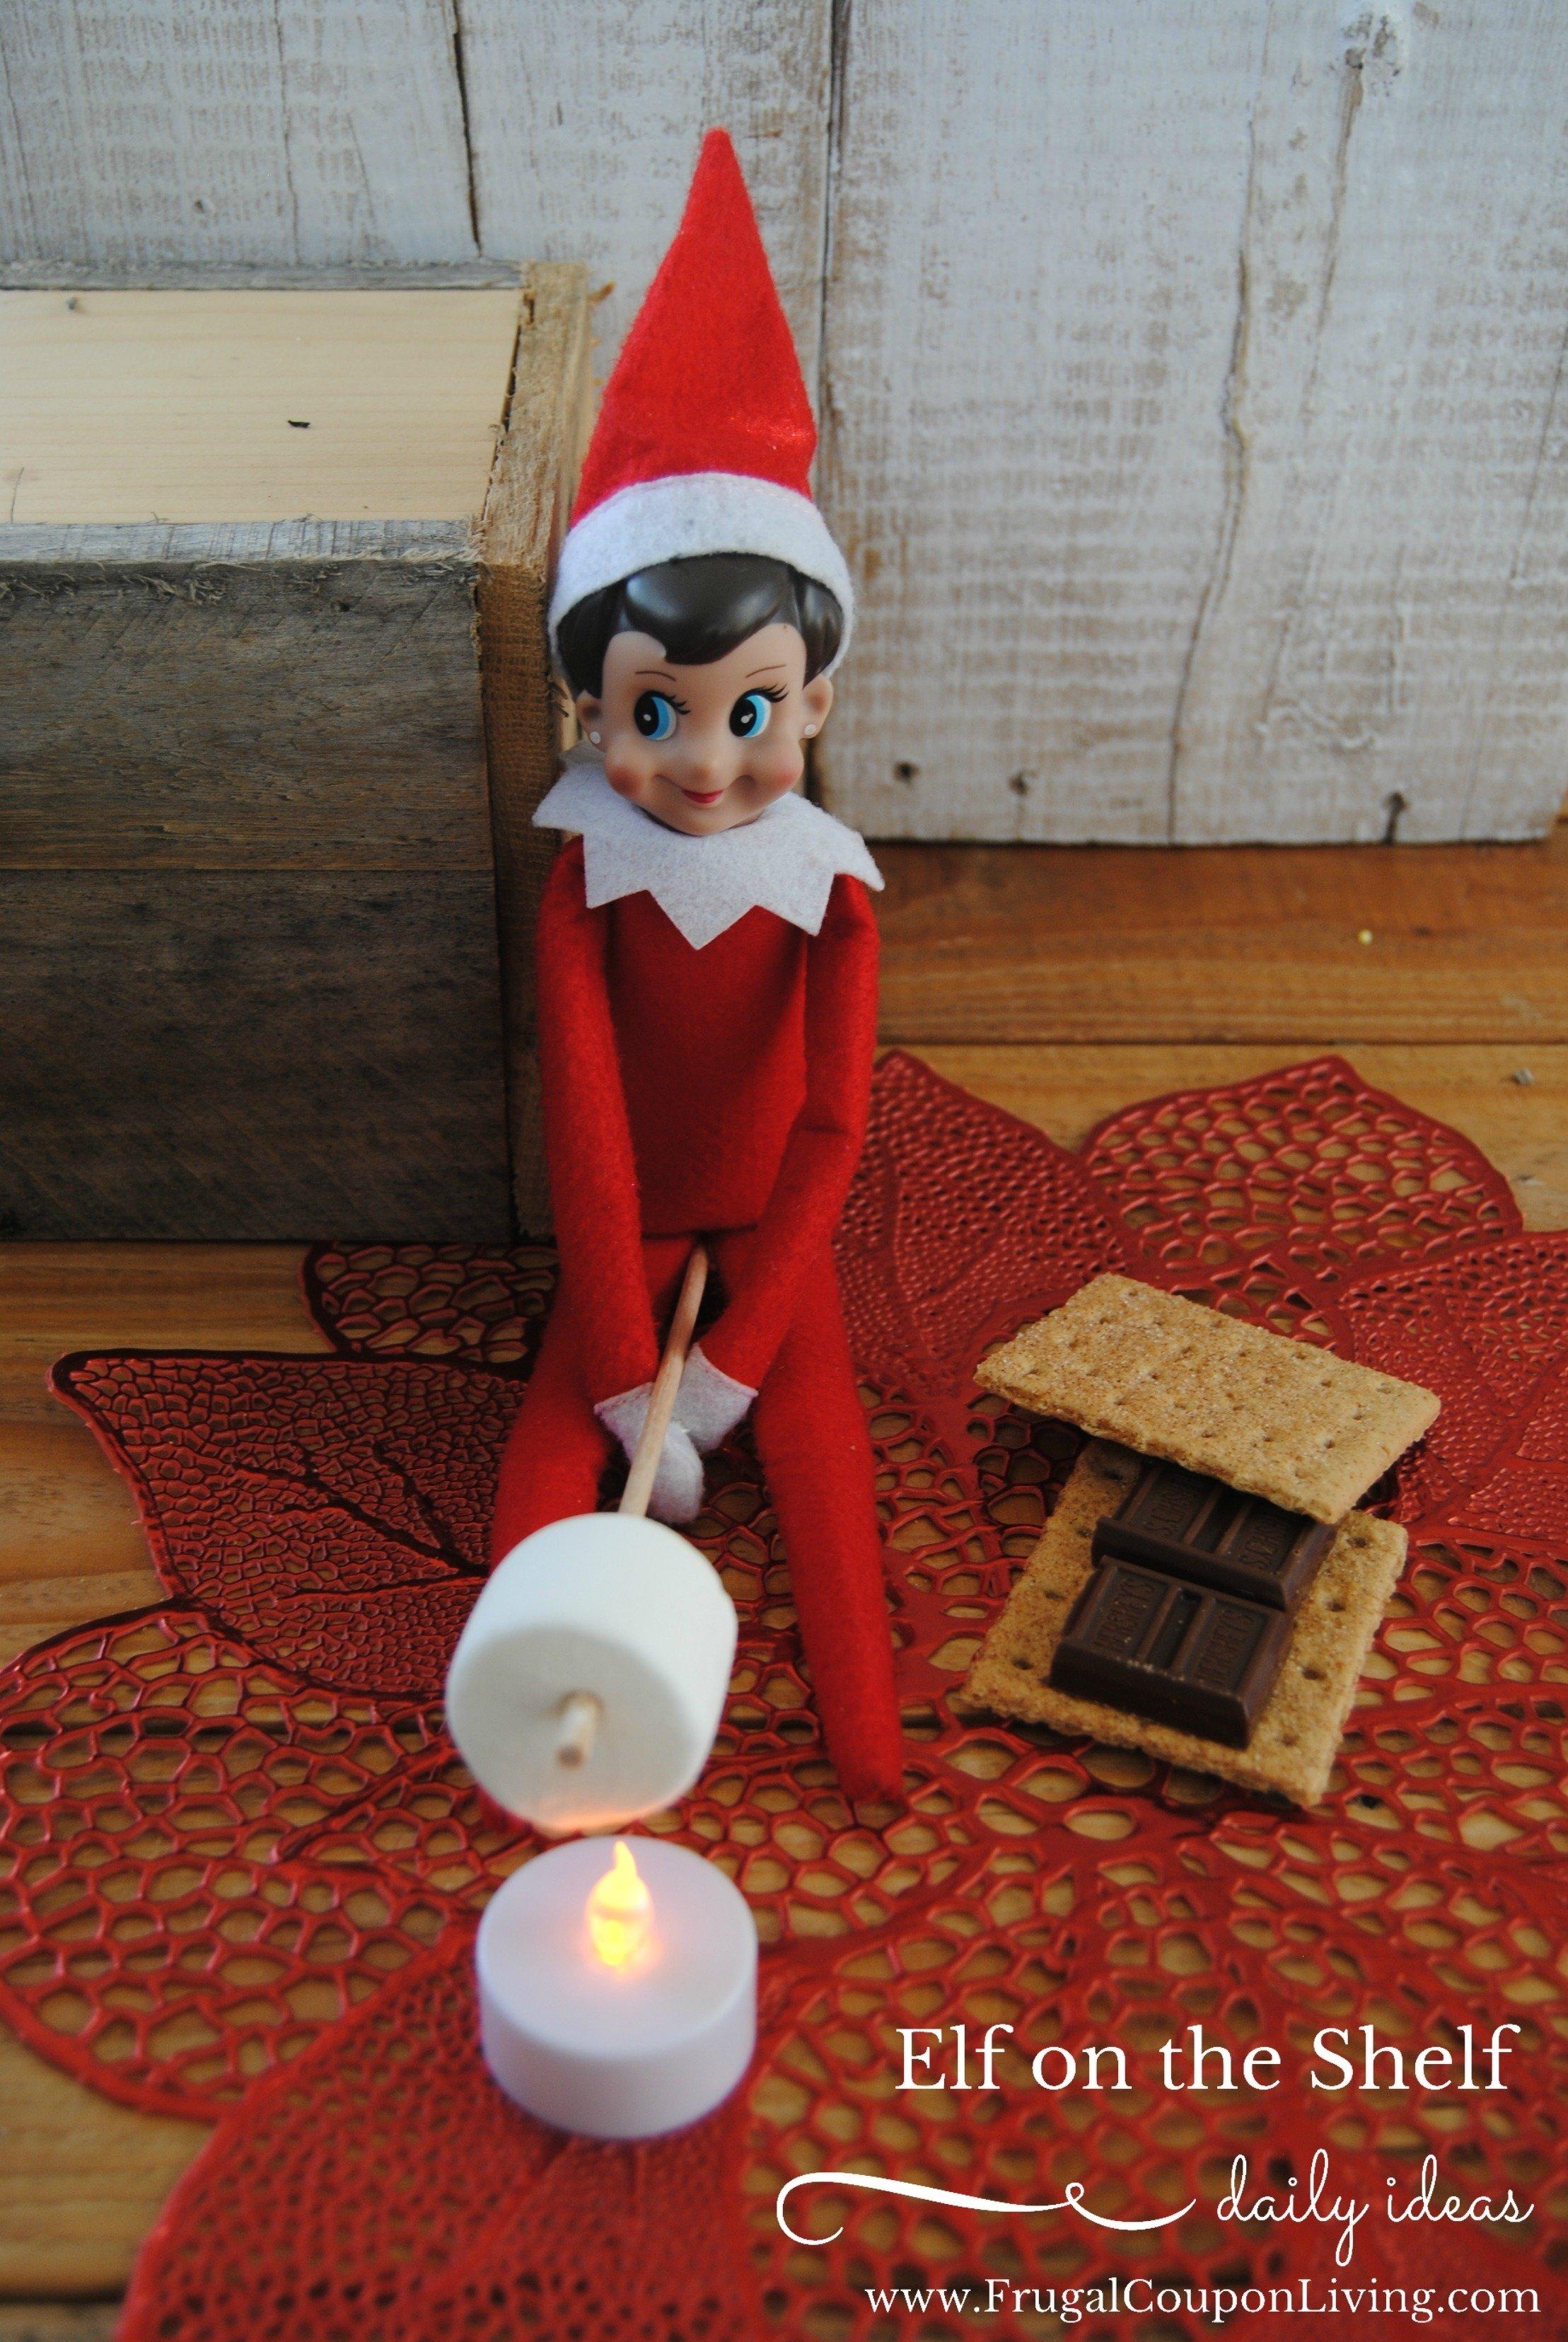 elf on the shelf ideas | elf makes s'mores